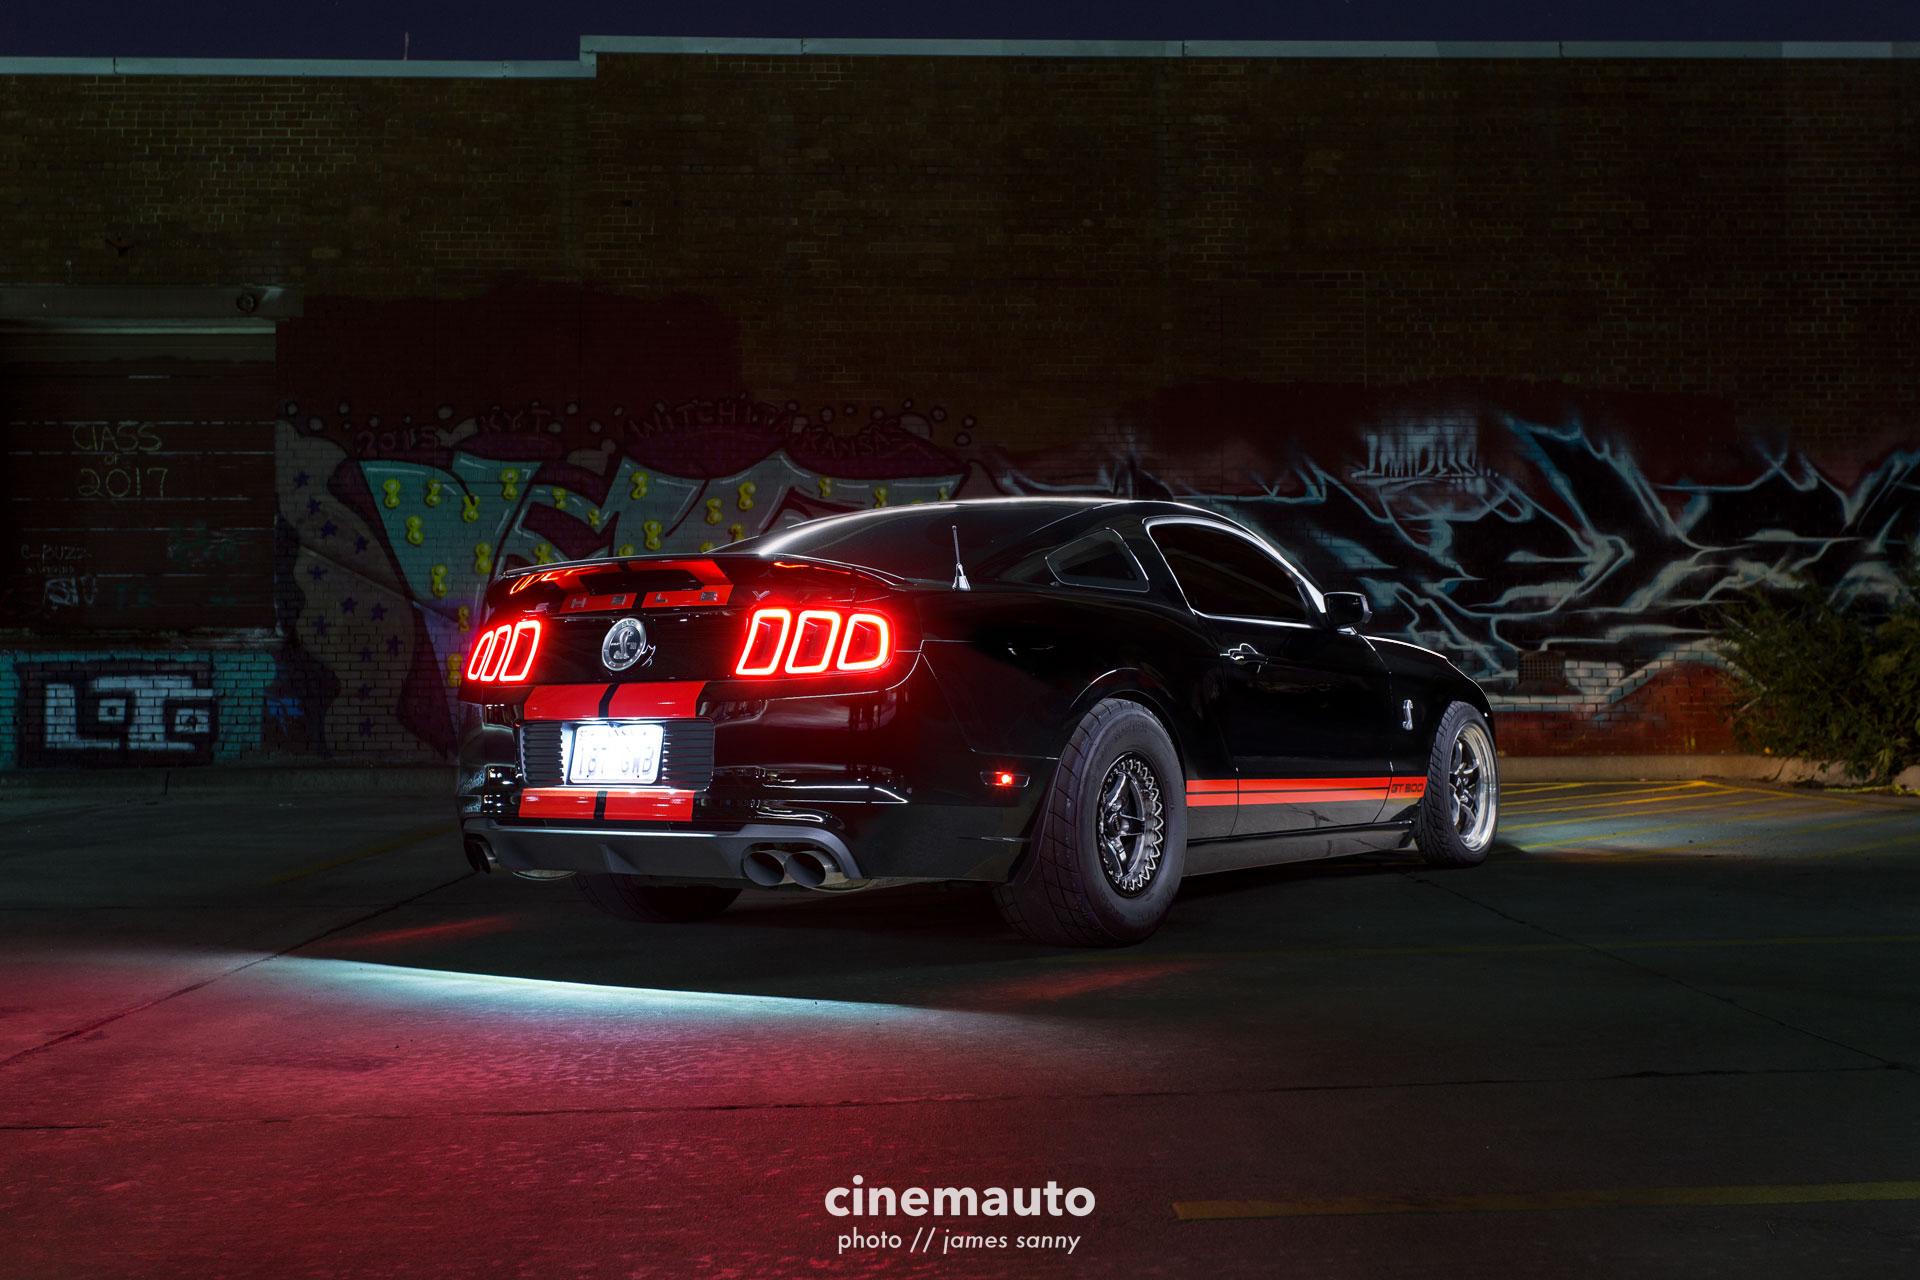 cinemauto-wichita-autmotive-photography-cj26a.jpg